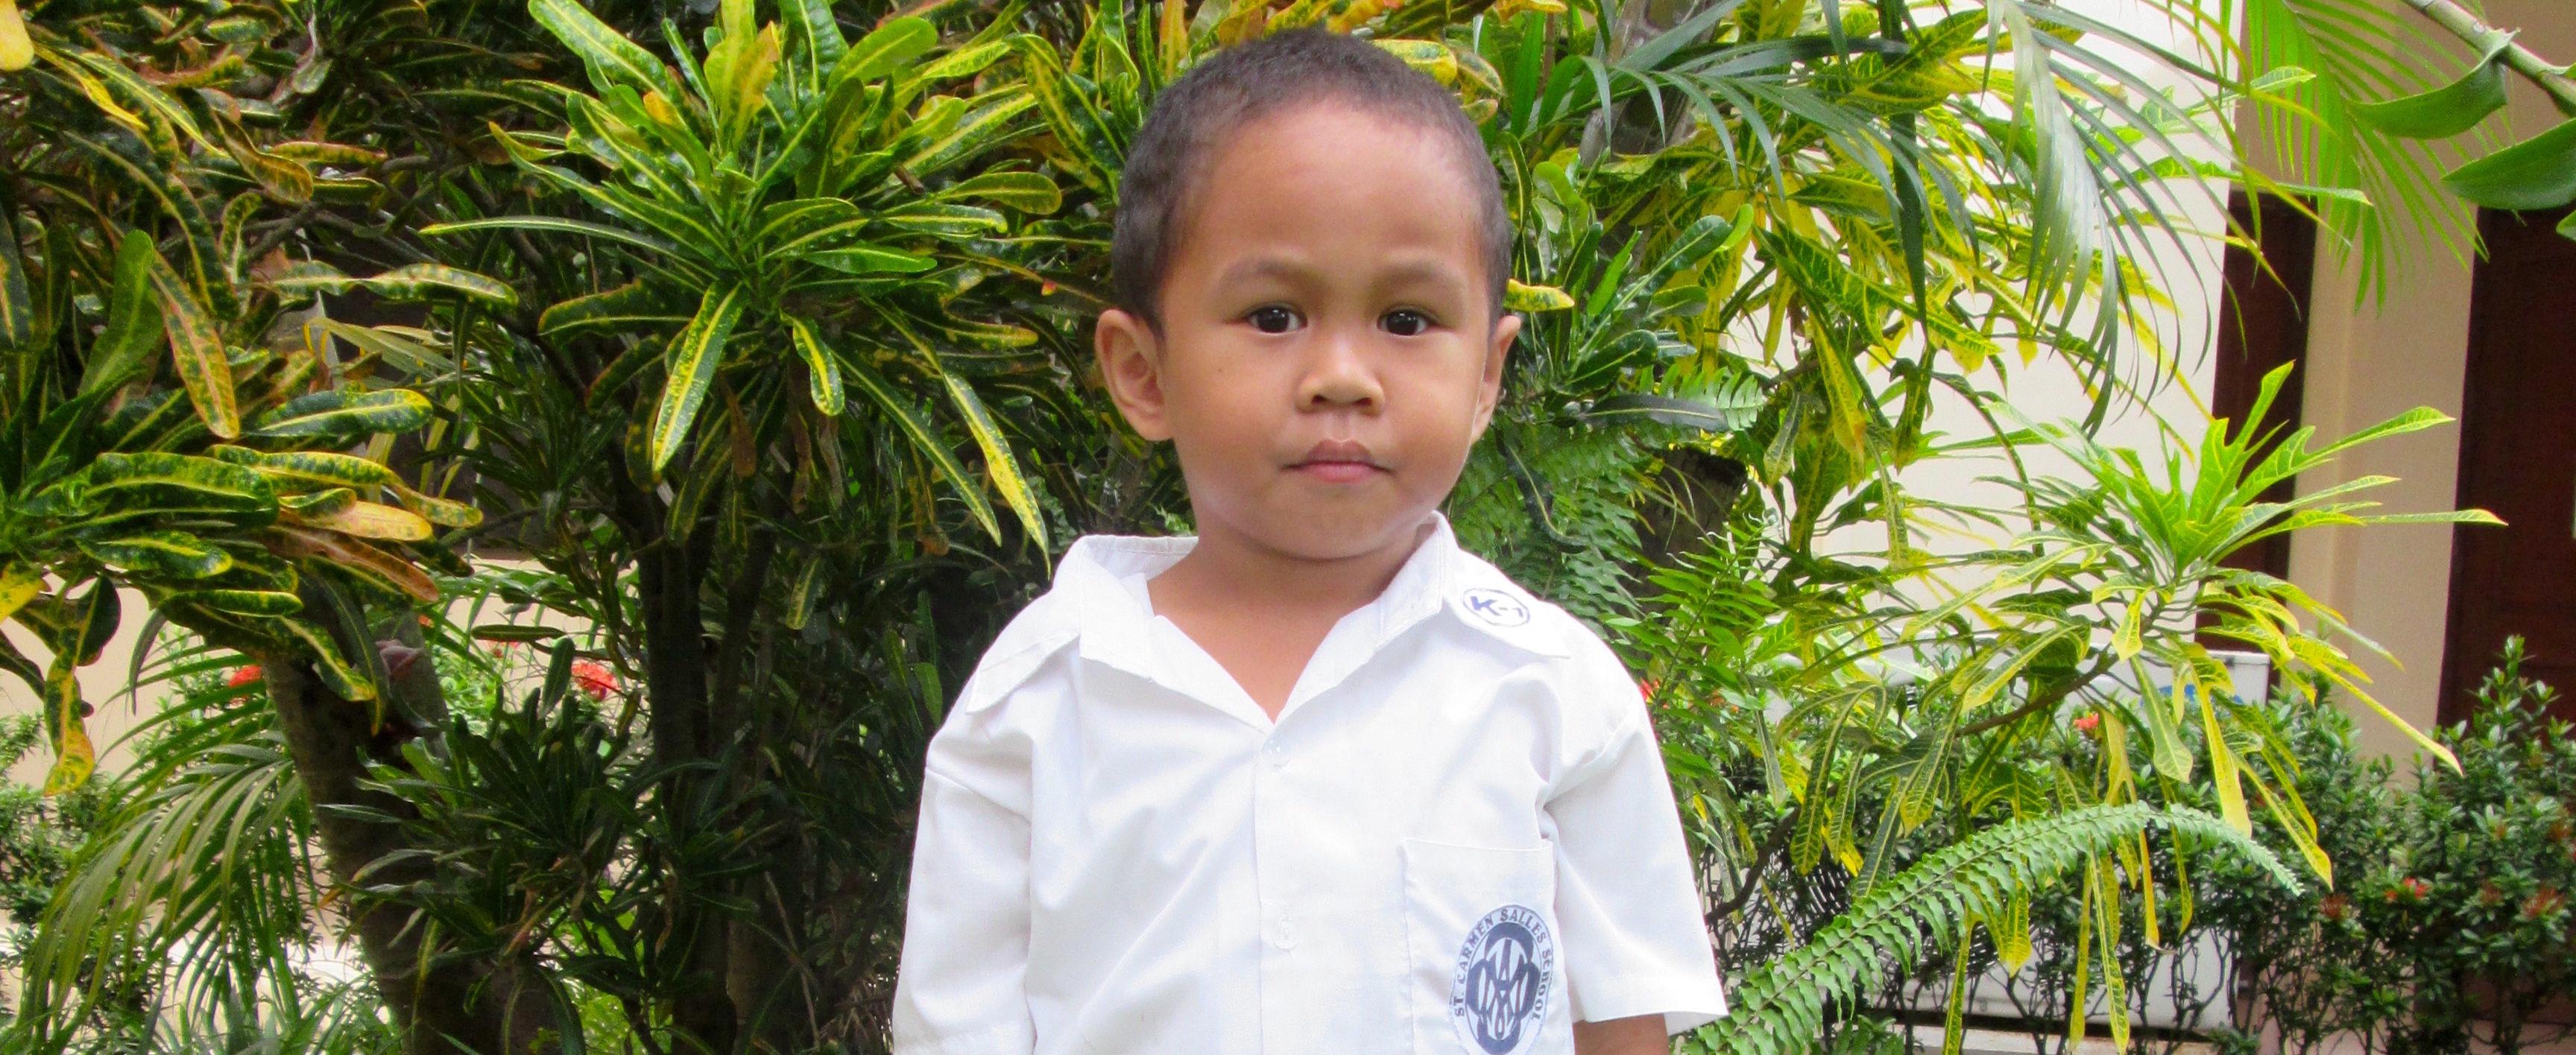 Sardido Justine, Bacolod en Filipinas